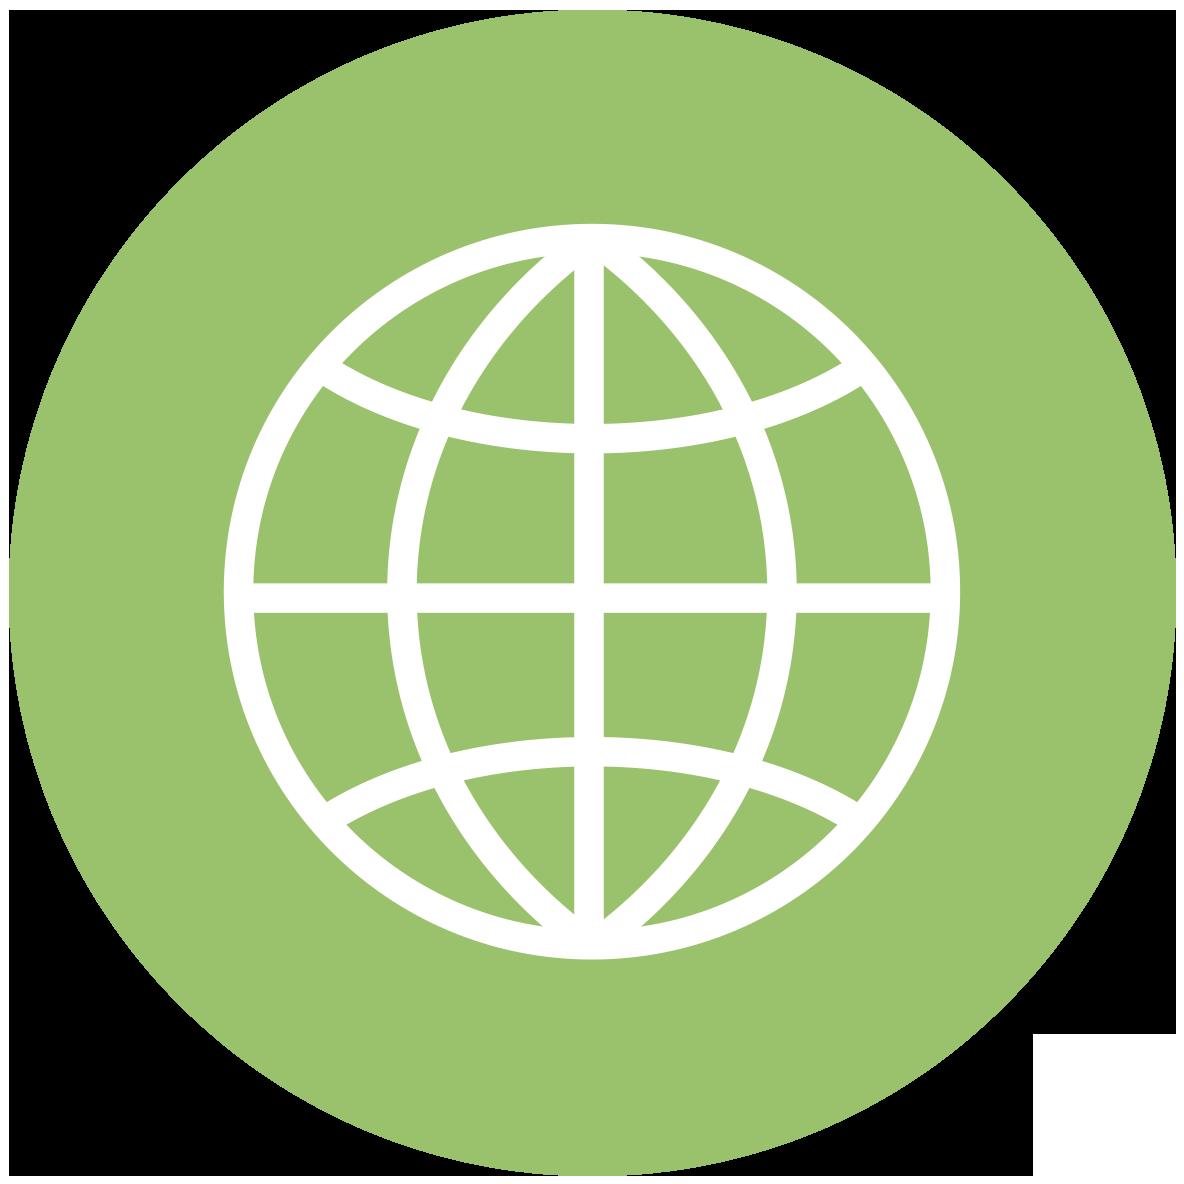 Website icon (green globe)